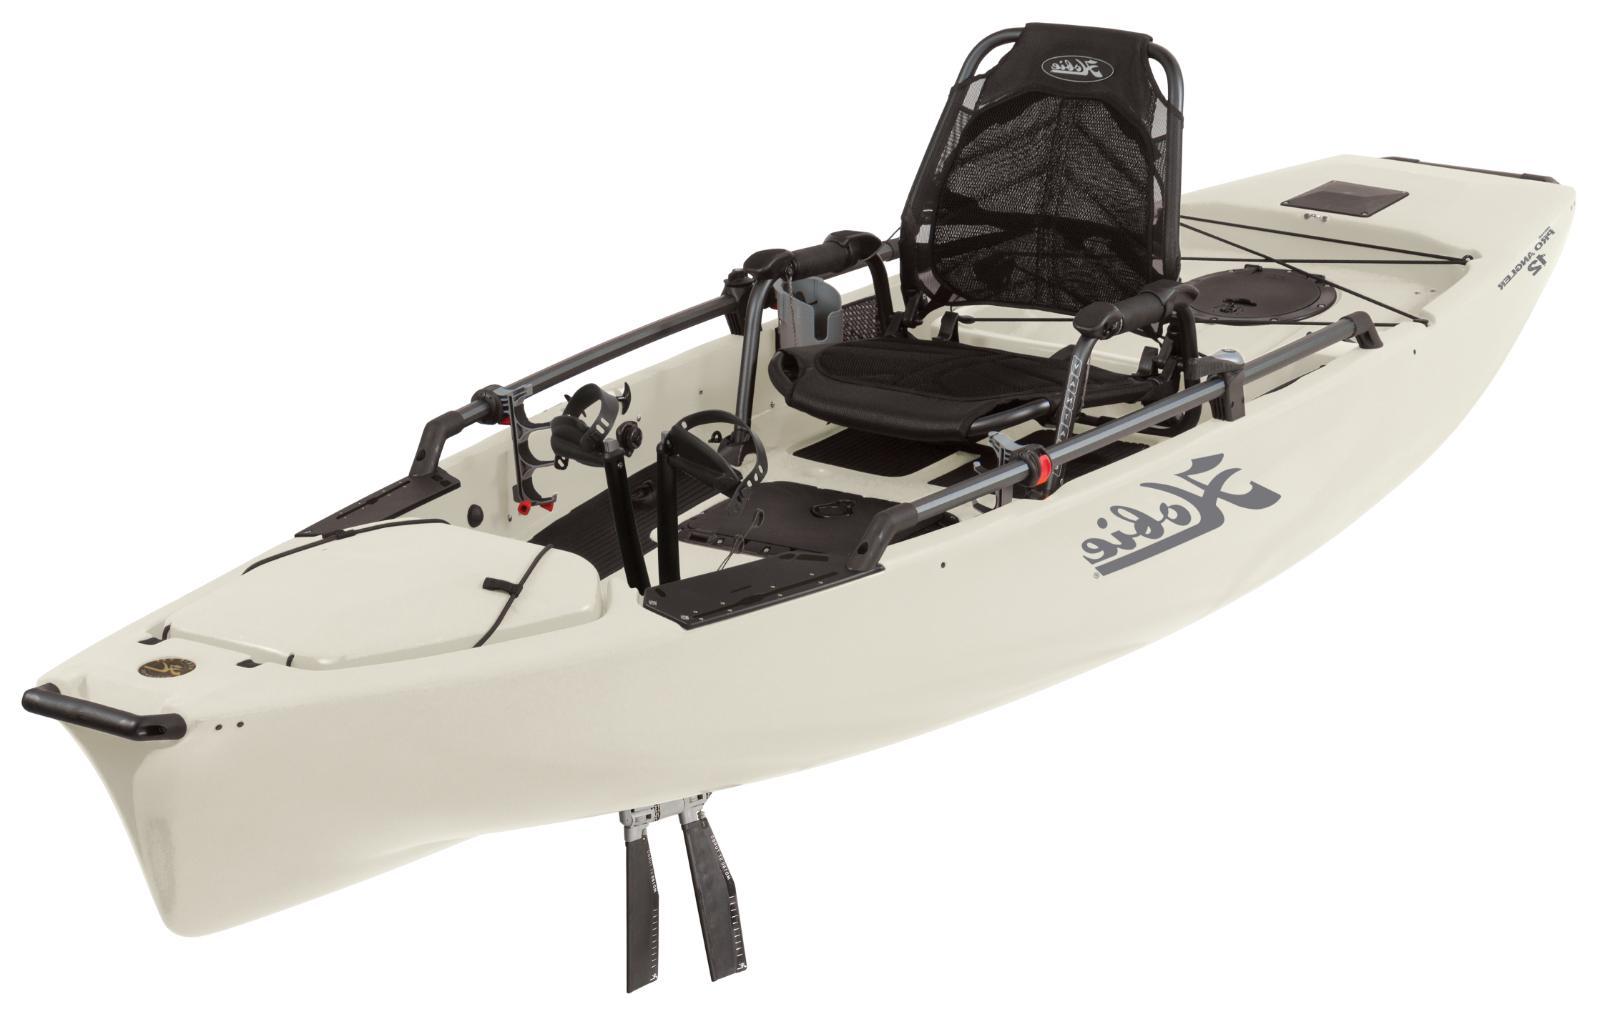 2019 Hobie Mirage Pro Angler 12 Fishing Kayak   Ivory Dune